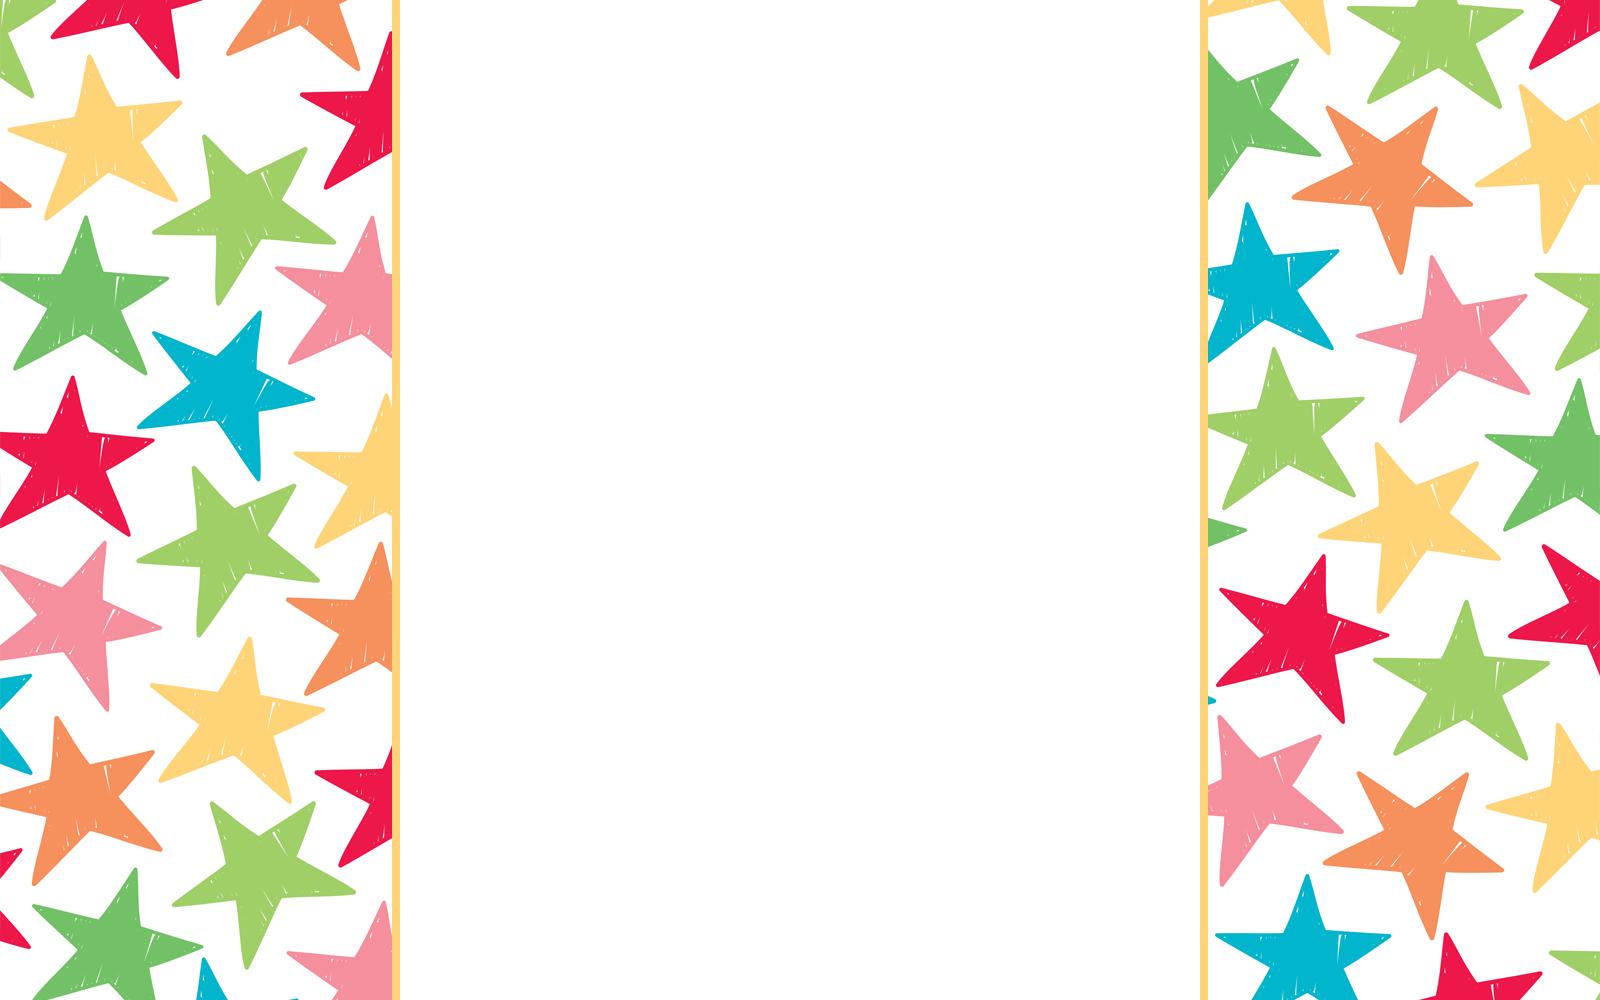 Yellow Star Border Clip Art | Clipart Panda - Free Clipart ...